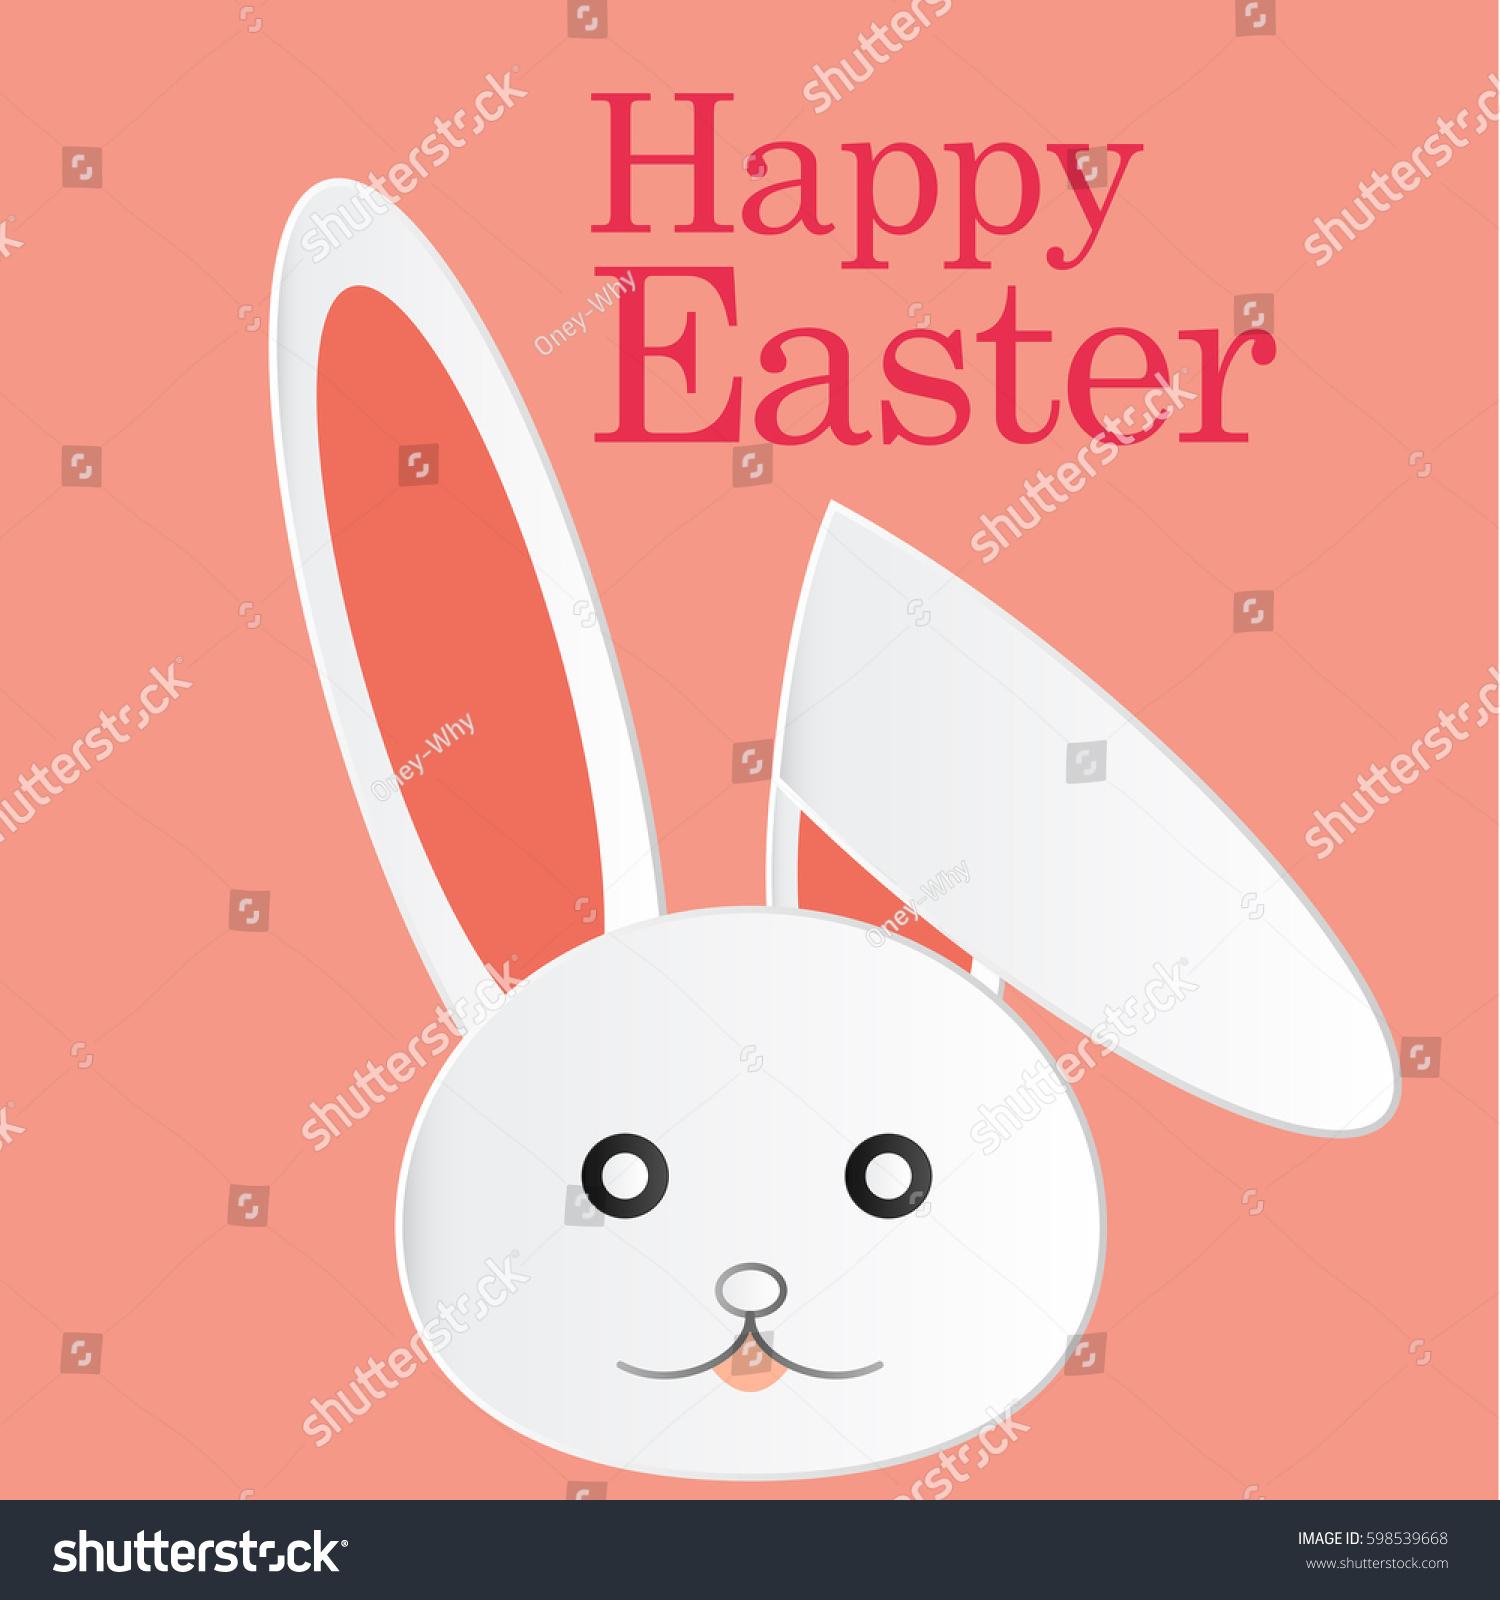 Happy Easter Day Stock Vector 598539668 - Shutterstock